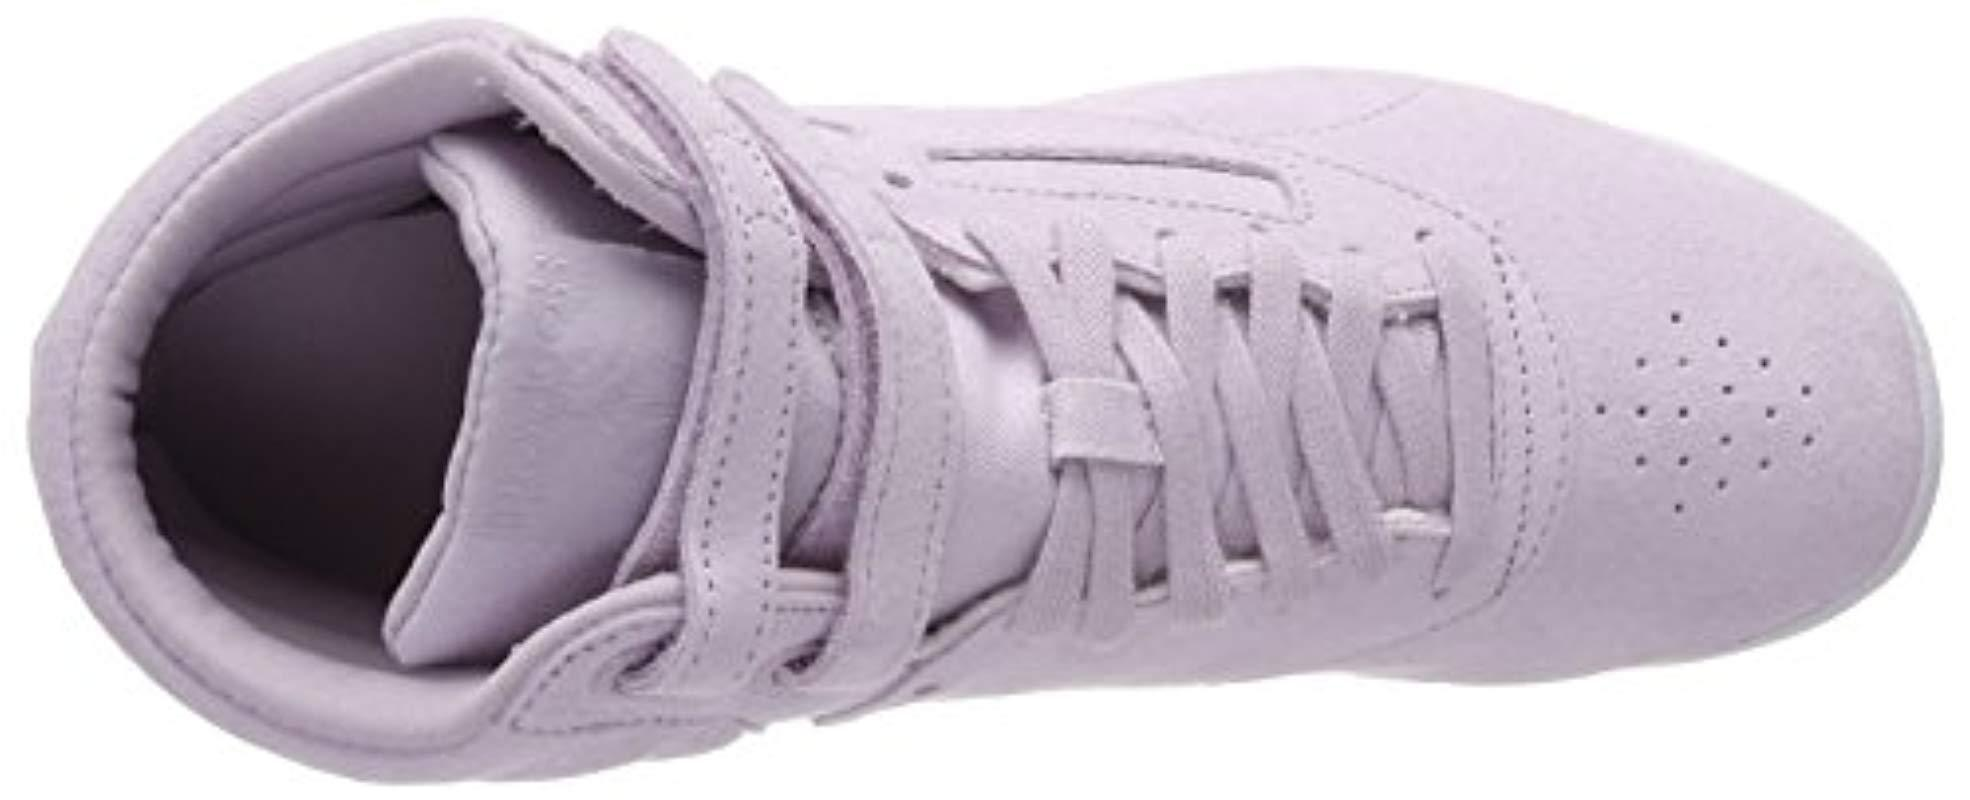 da230bef875b Reebok  s F s Hi Nbk Fitness Shoes